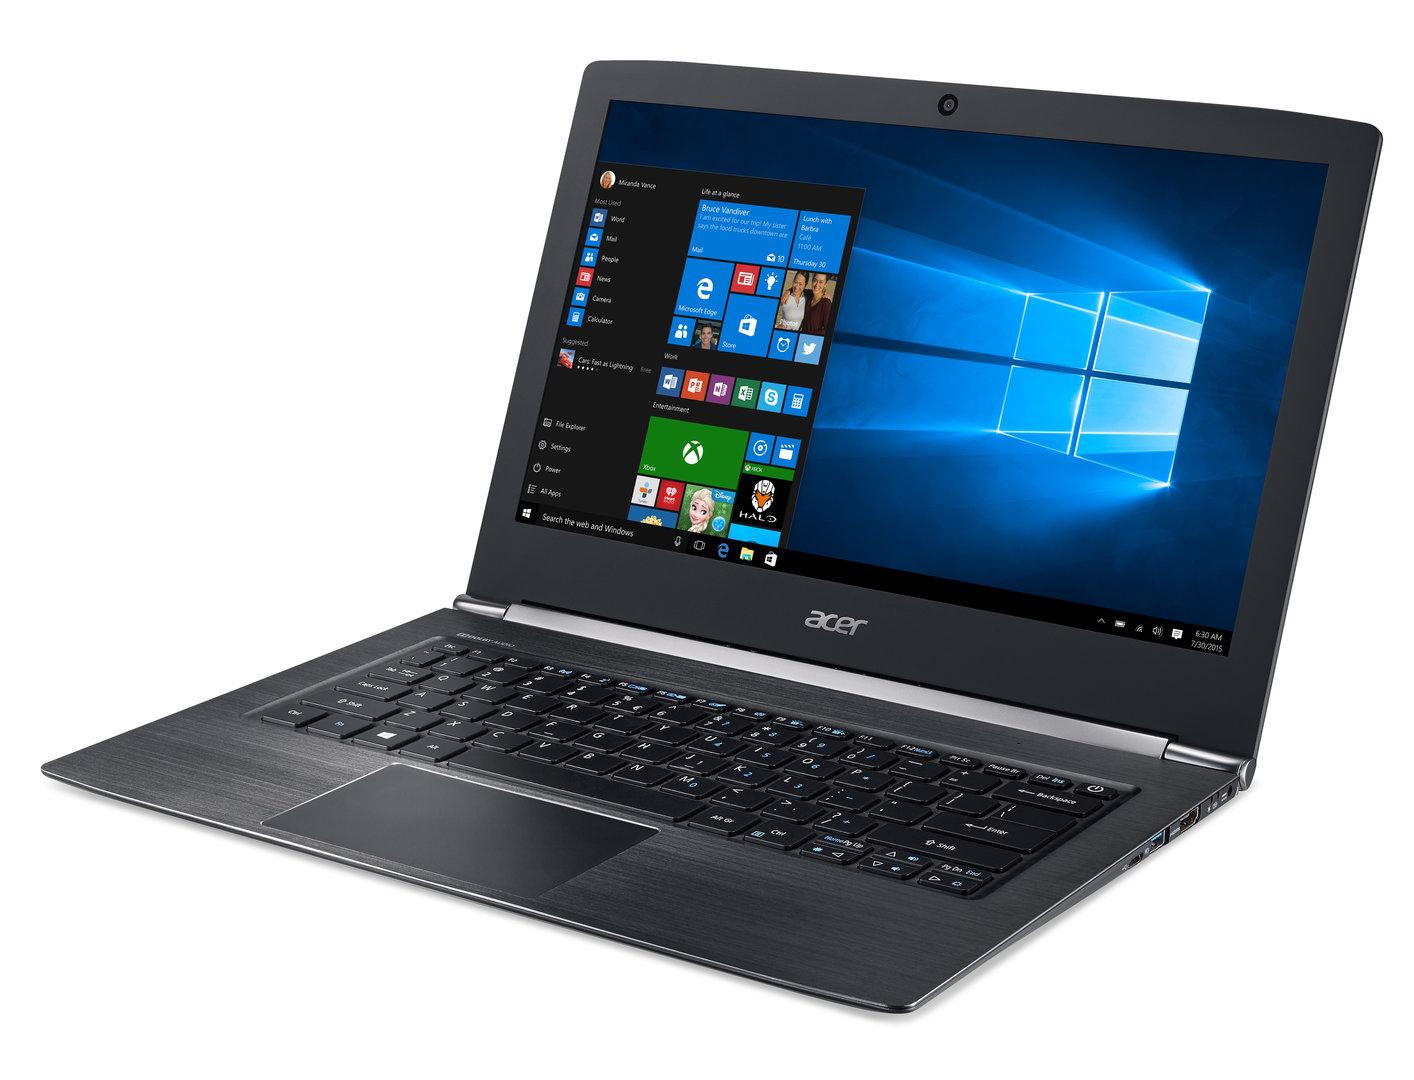 Acer Aspire S 13